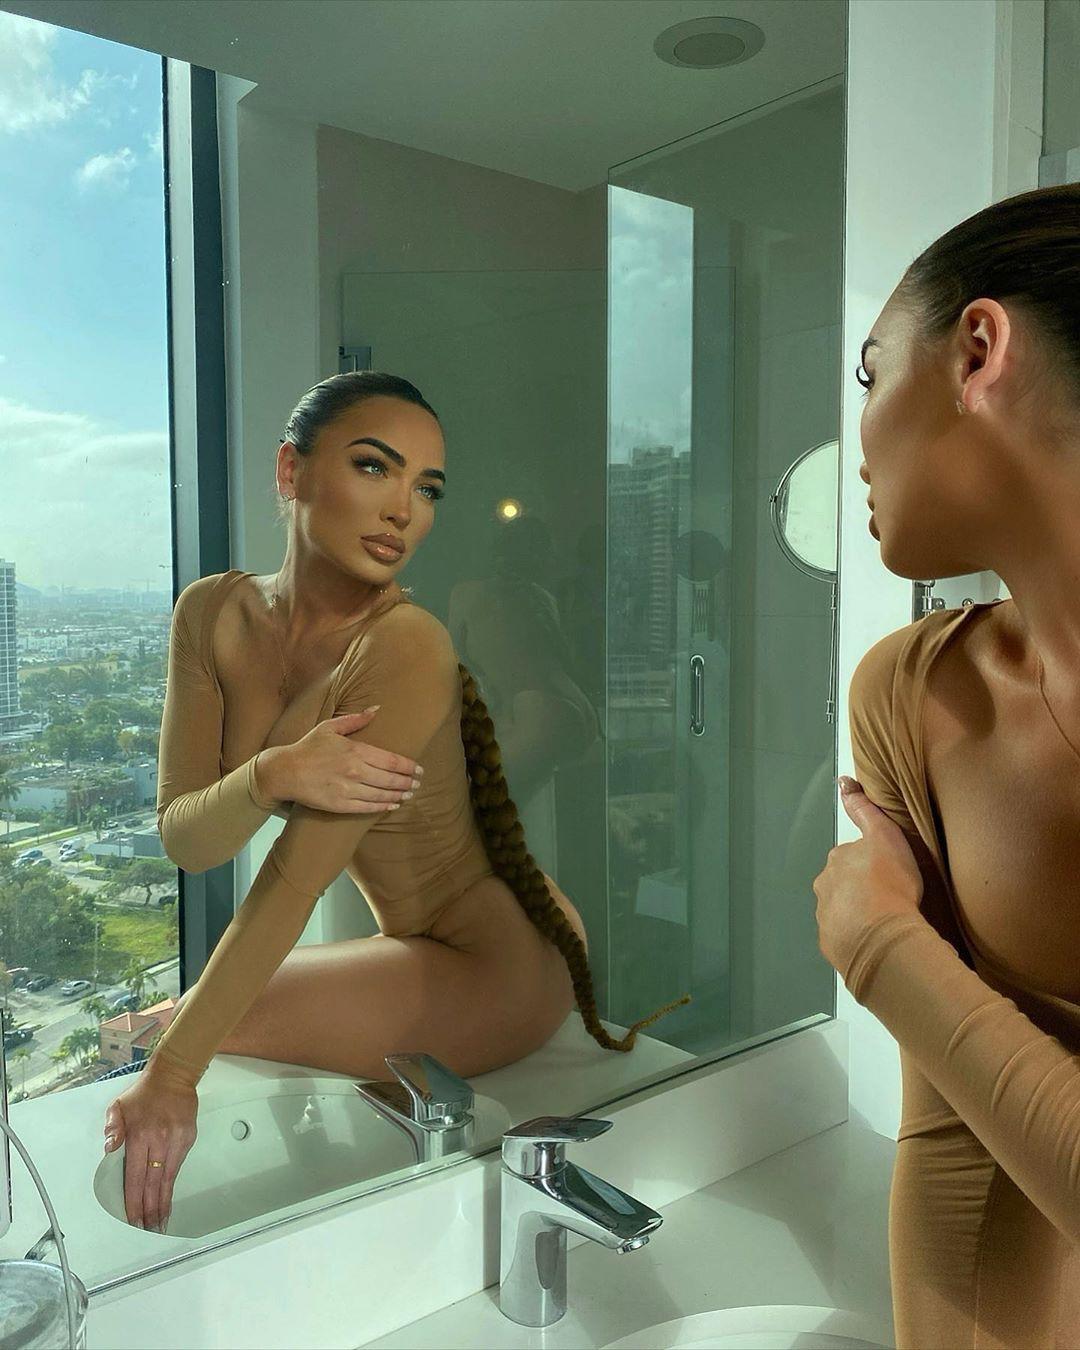 Gabriella Depardon legs picture, fit & fine body, plumbing fixture